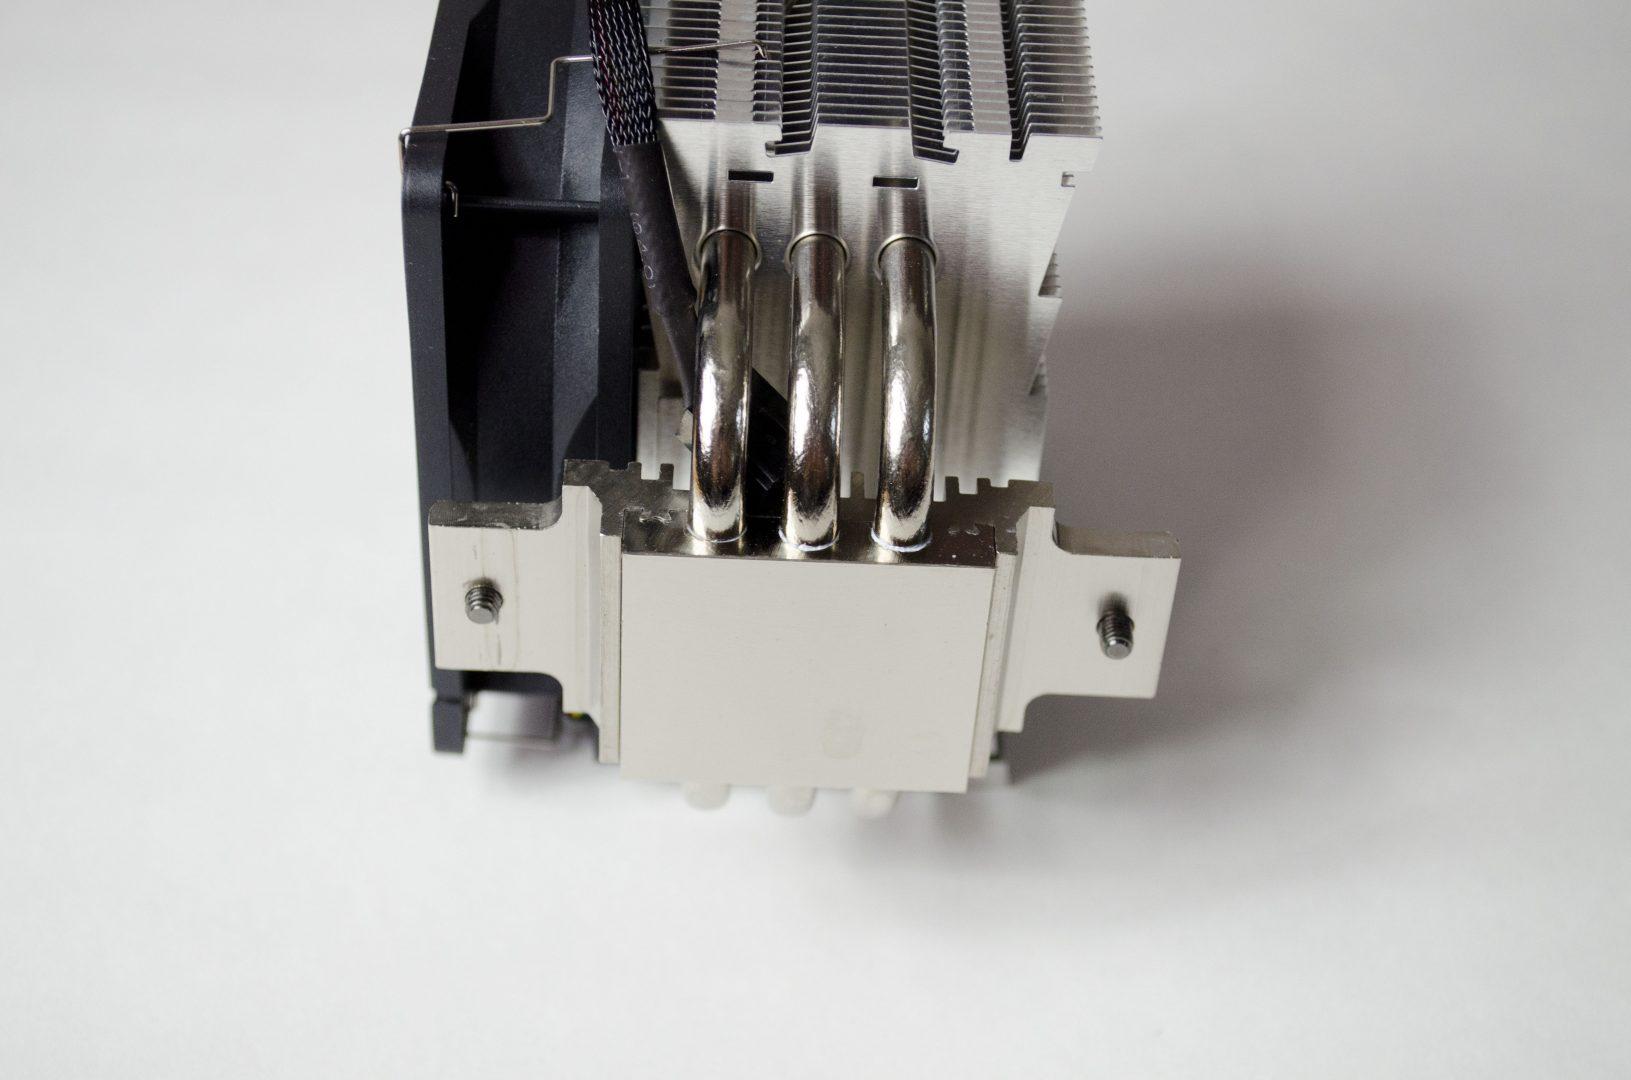 cryorig m9i cpu cooler review_7